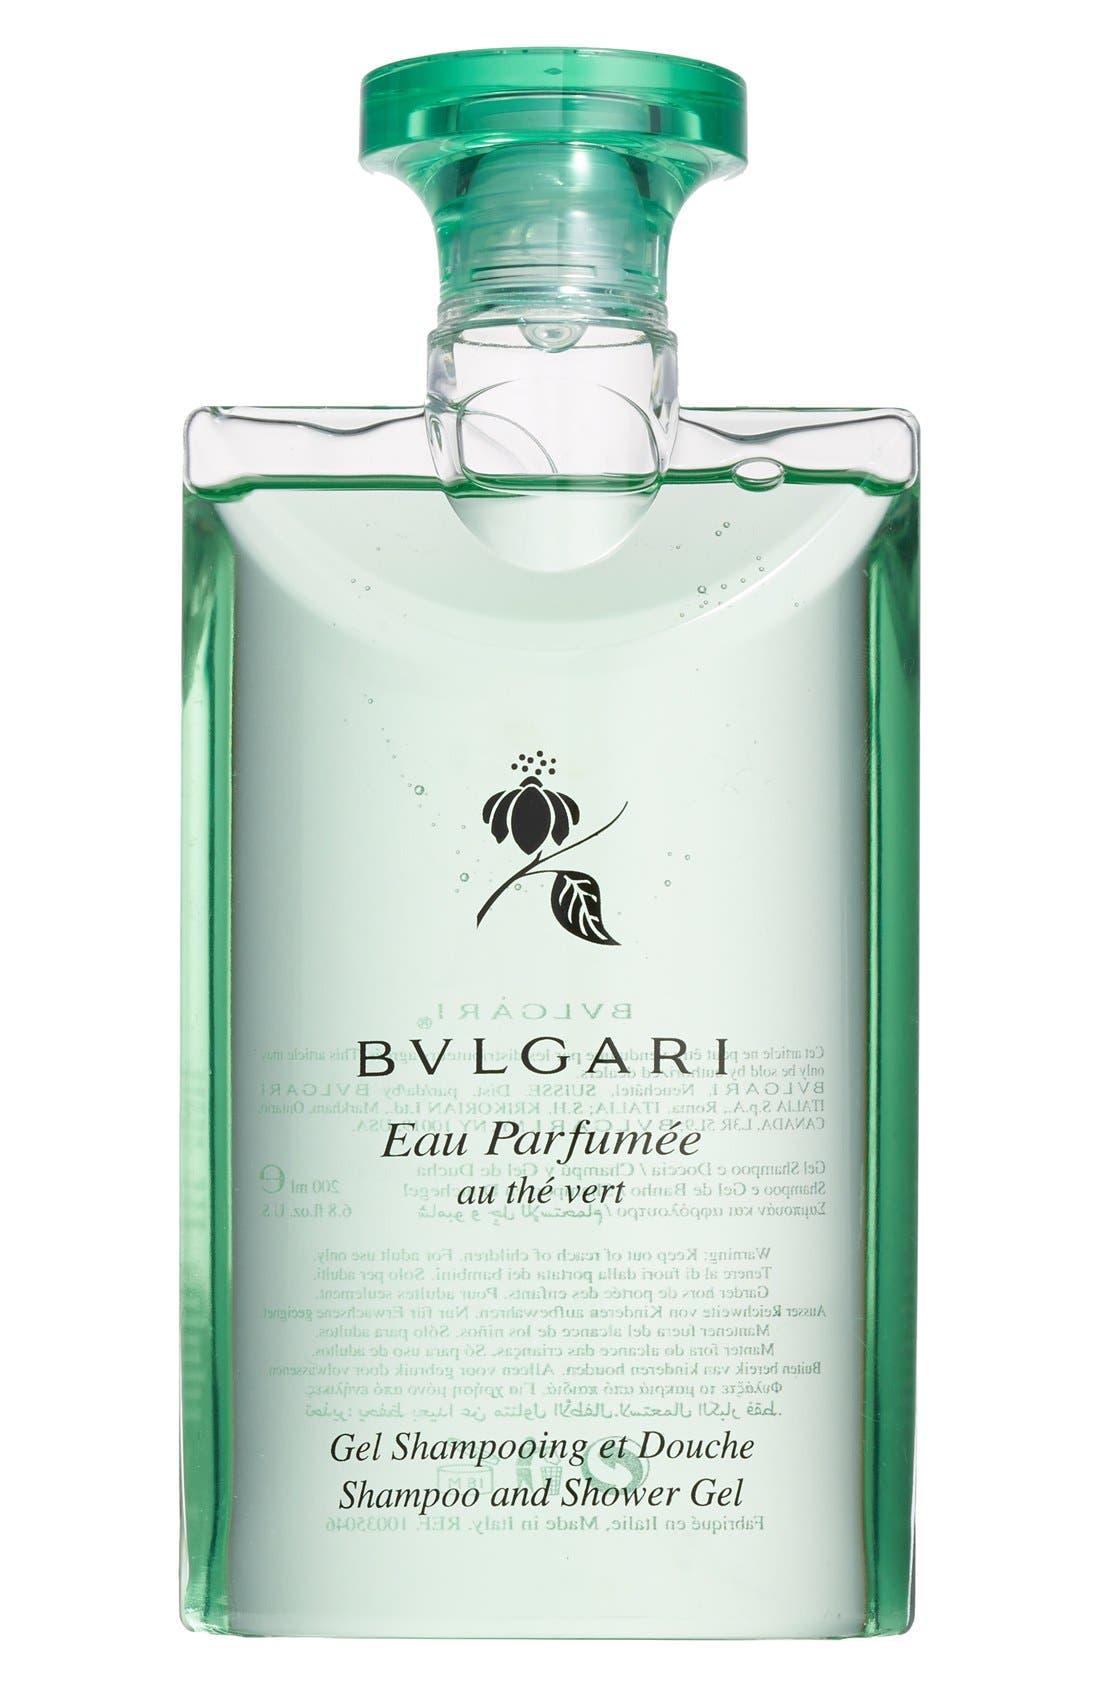 BVLGARI 'Eau Parfumée au thé vert' Shampoo and Shower Gel